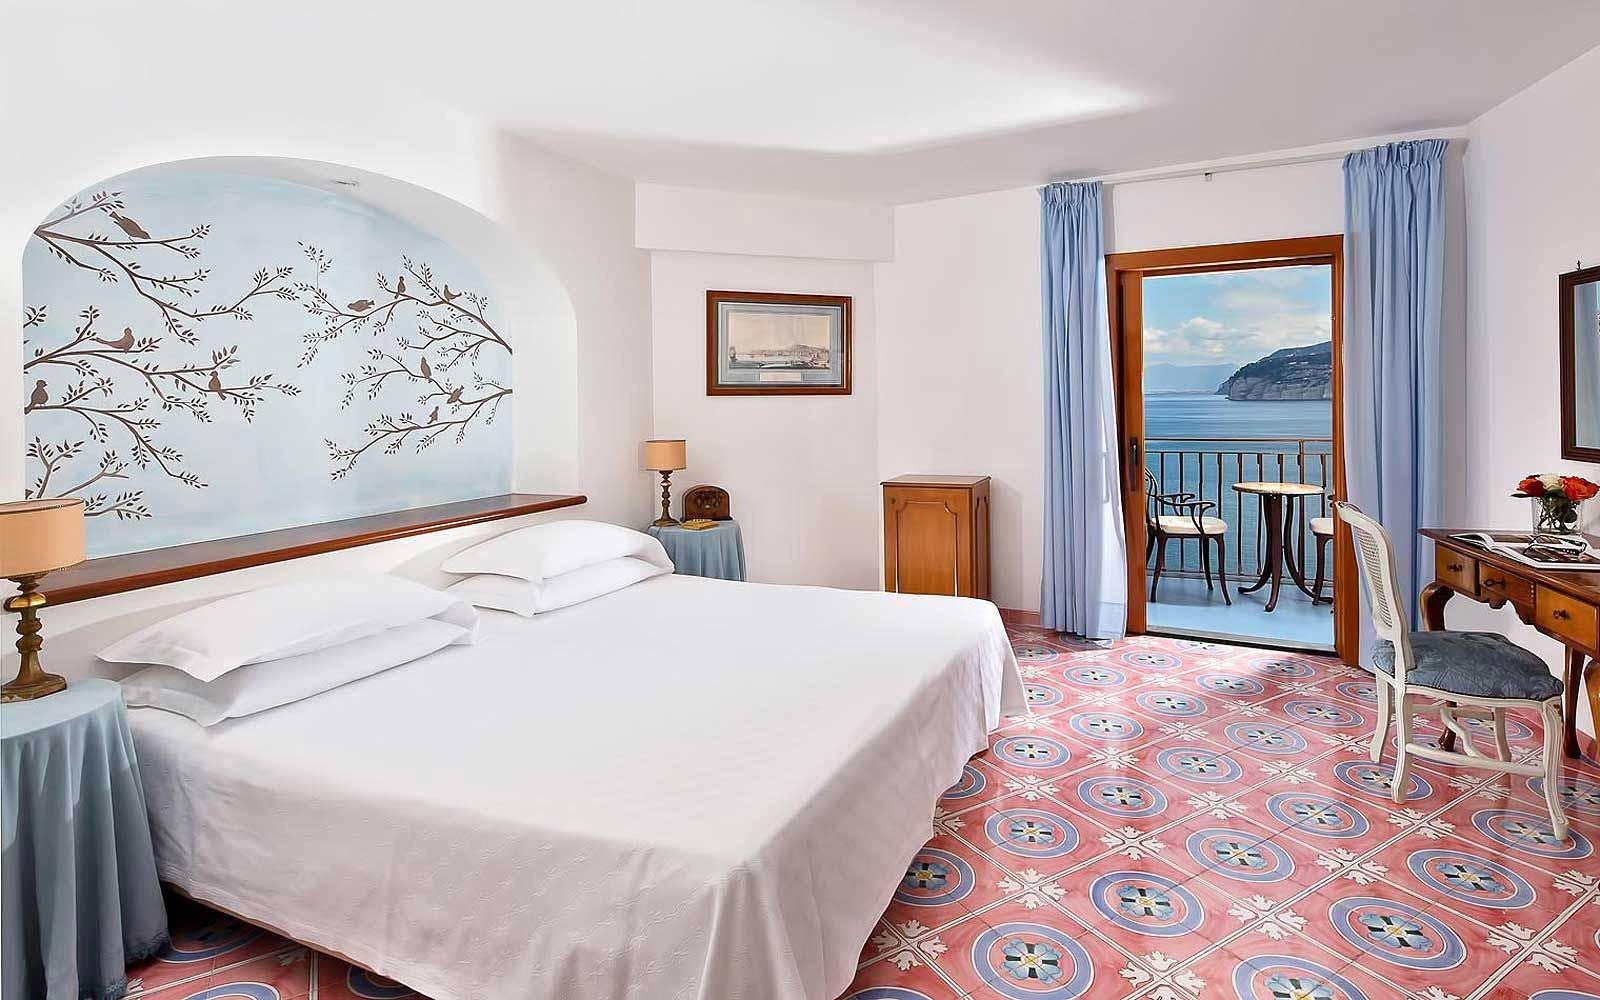 Standard room at Hotel Belair